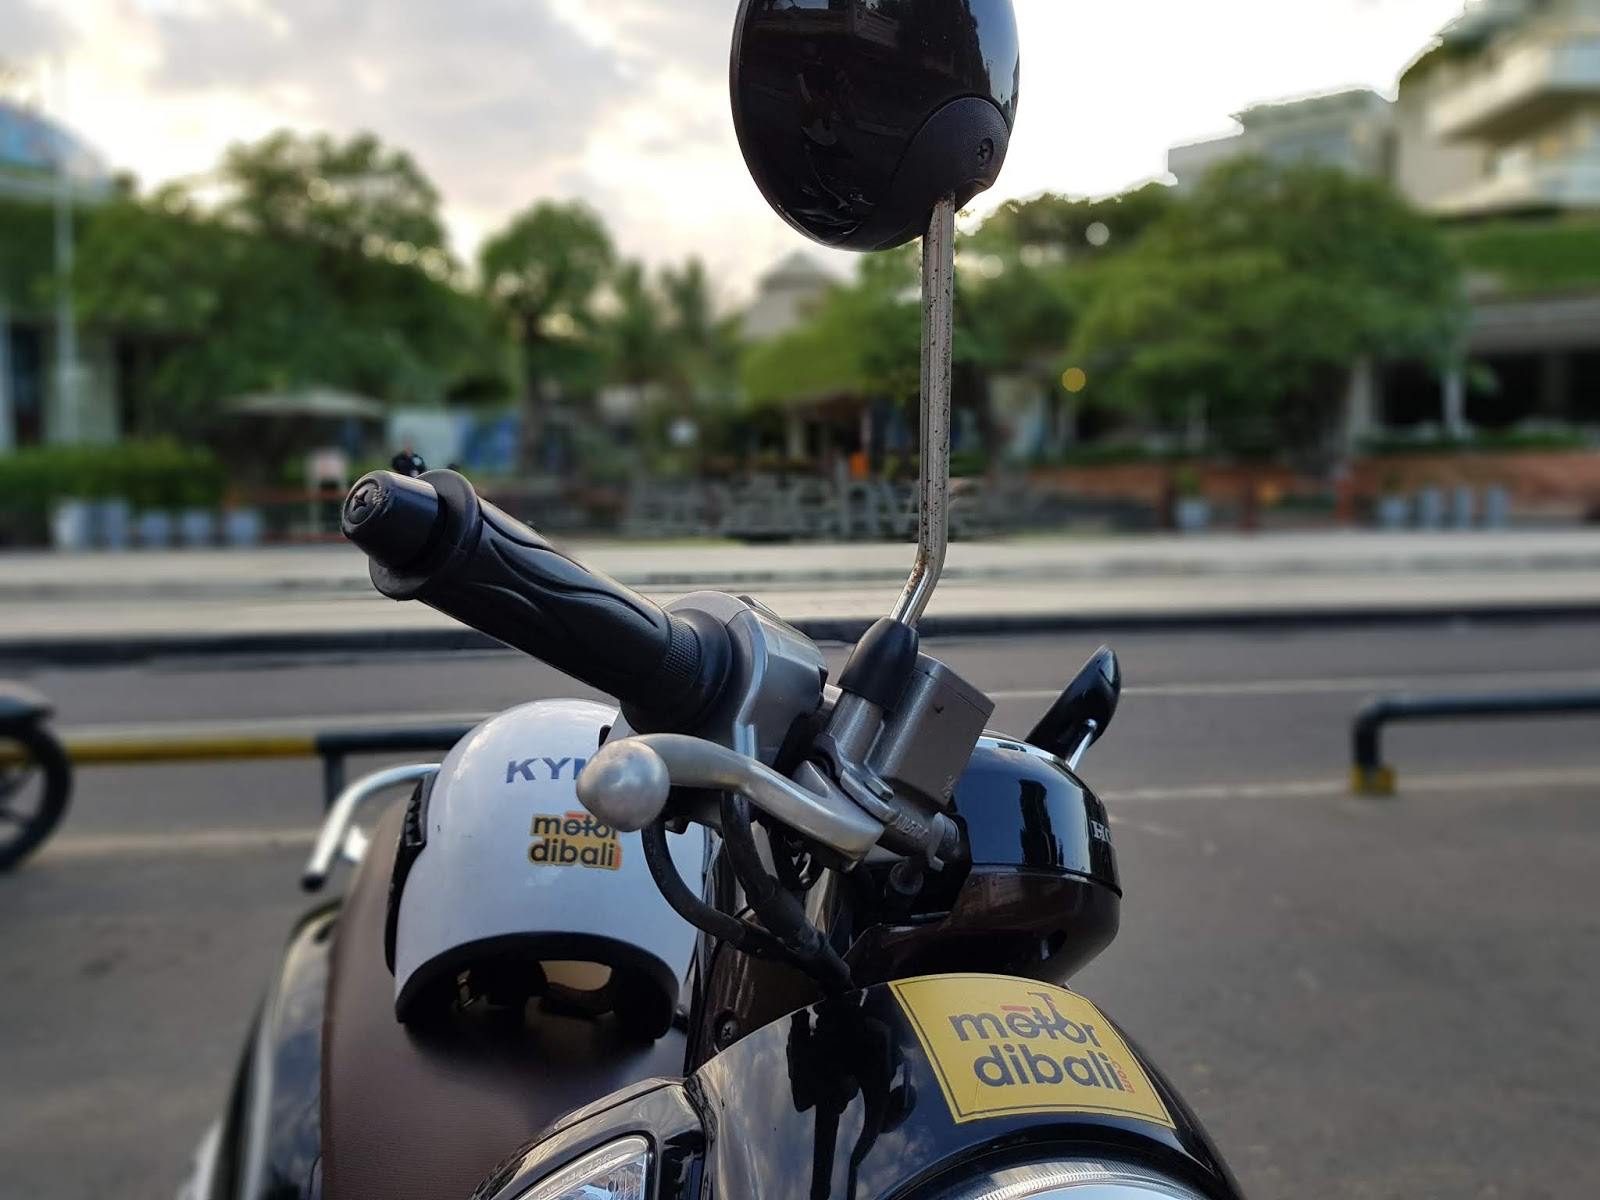 Sewa Motor di Denpasar Bali, Solusi Terbaik Atasi Kemacetan